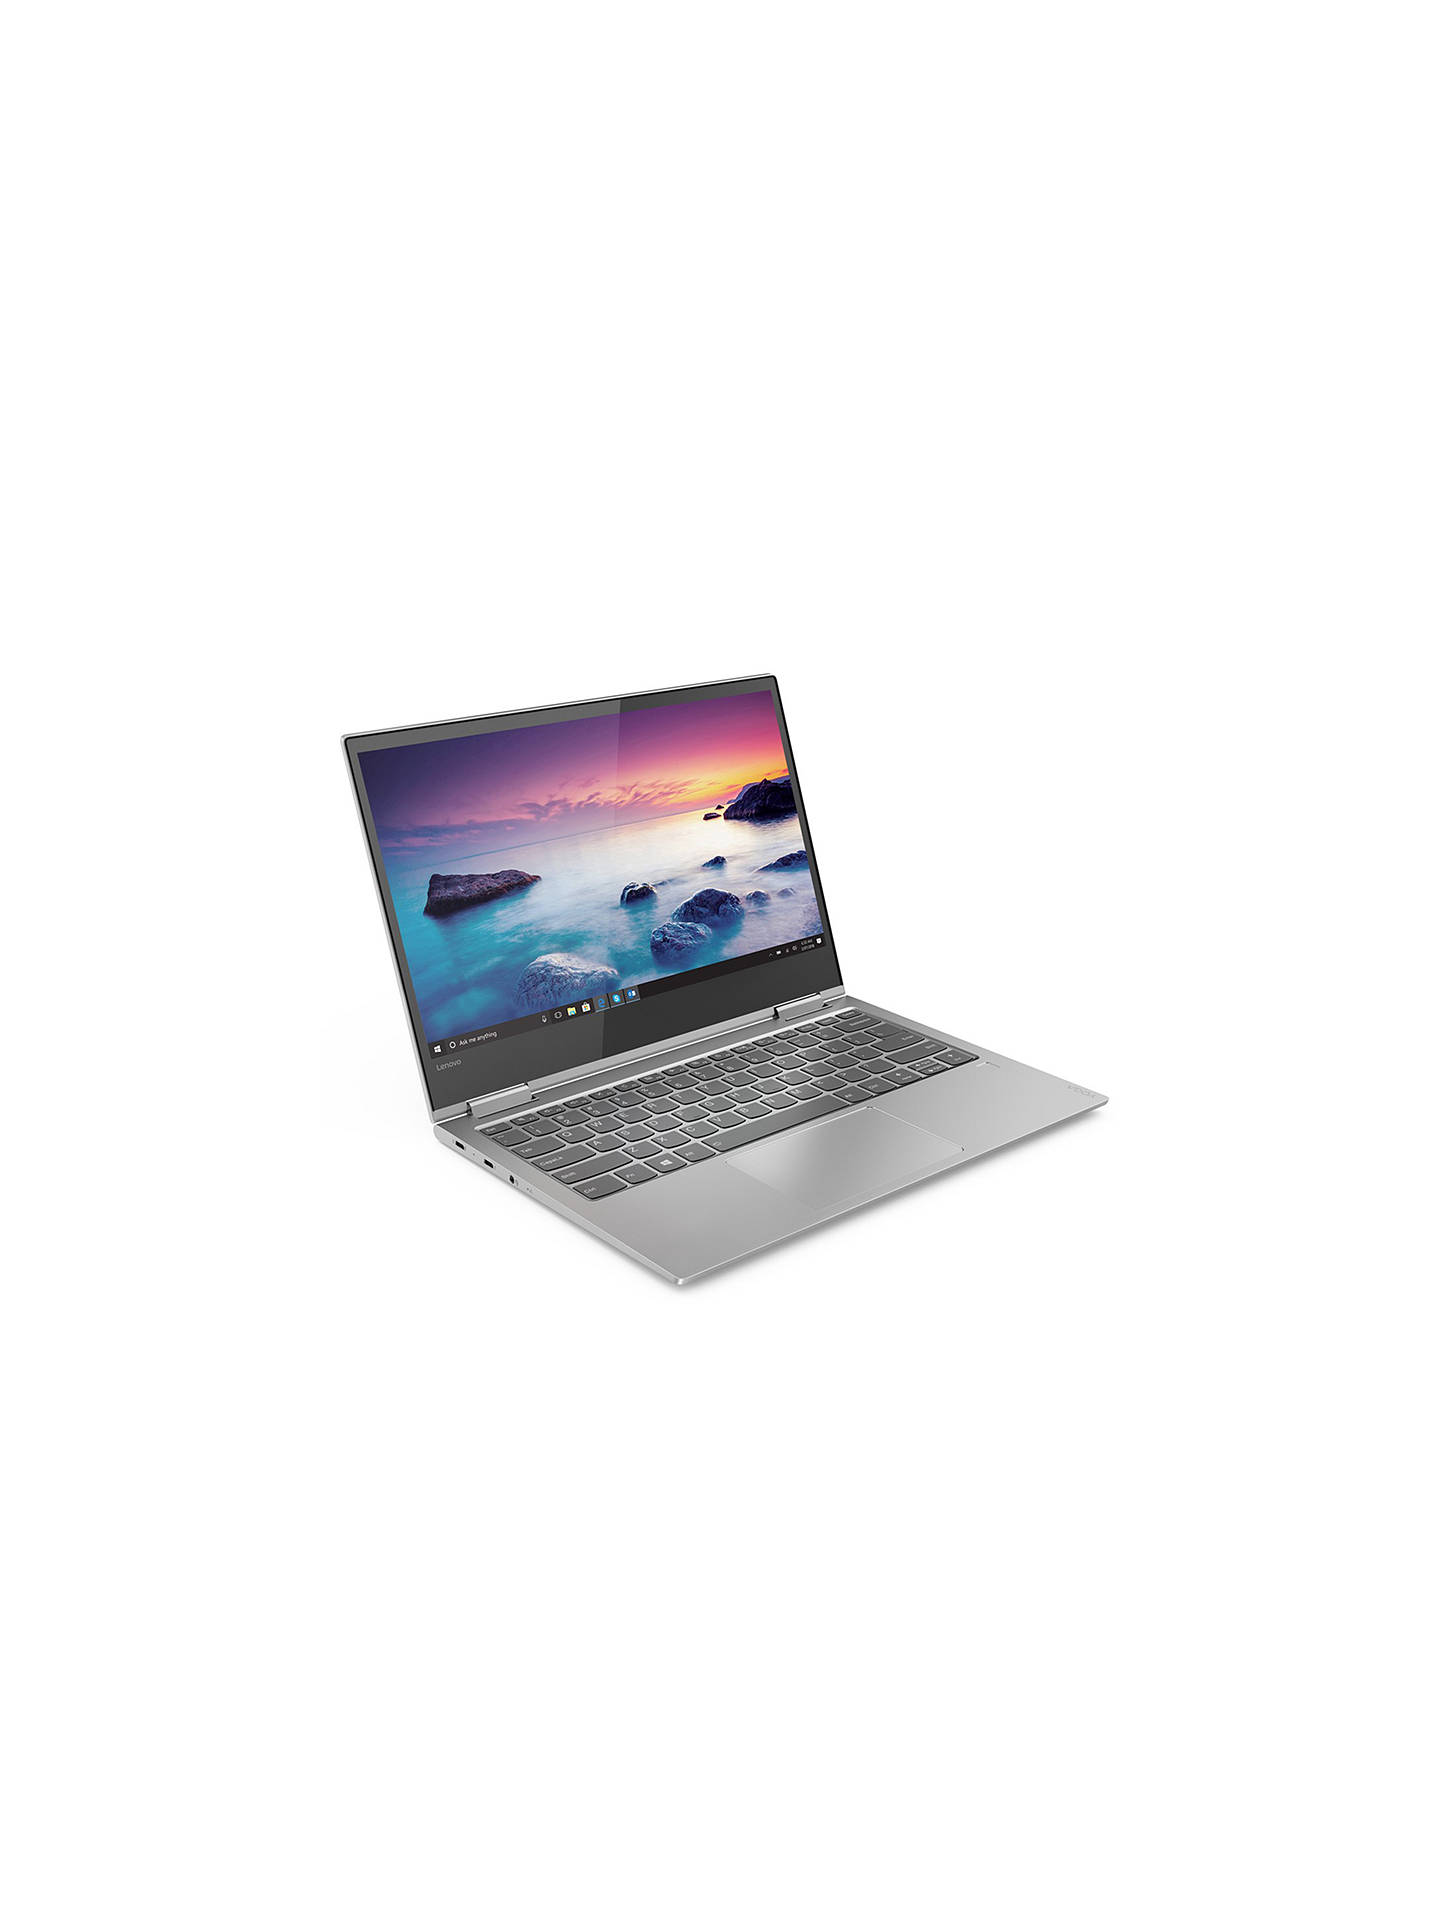 Lenovo Yoga 730 Convertible Laptop, Intel Core i5, 8GB RAM, 256GB SSD, 13 3